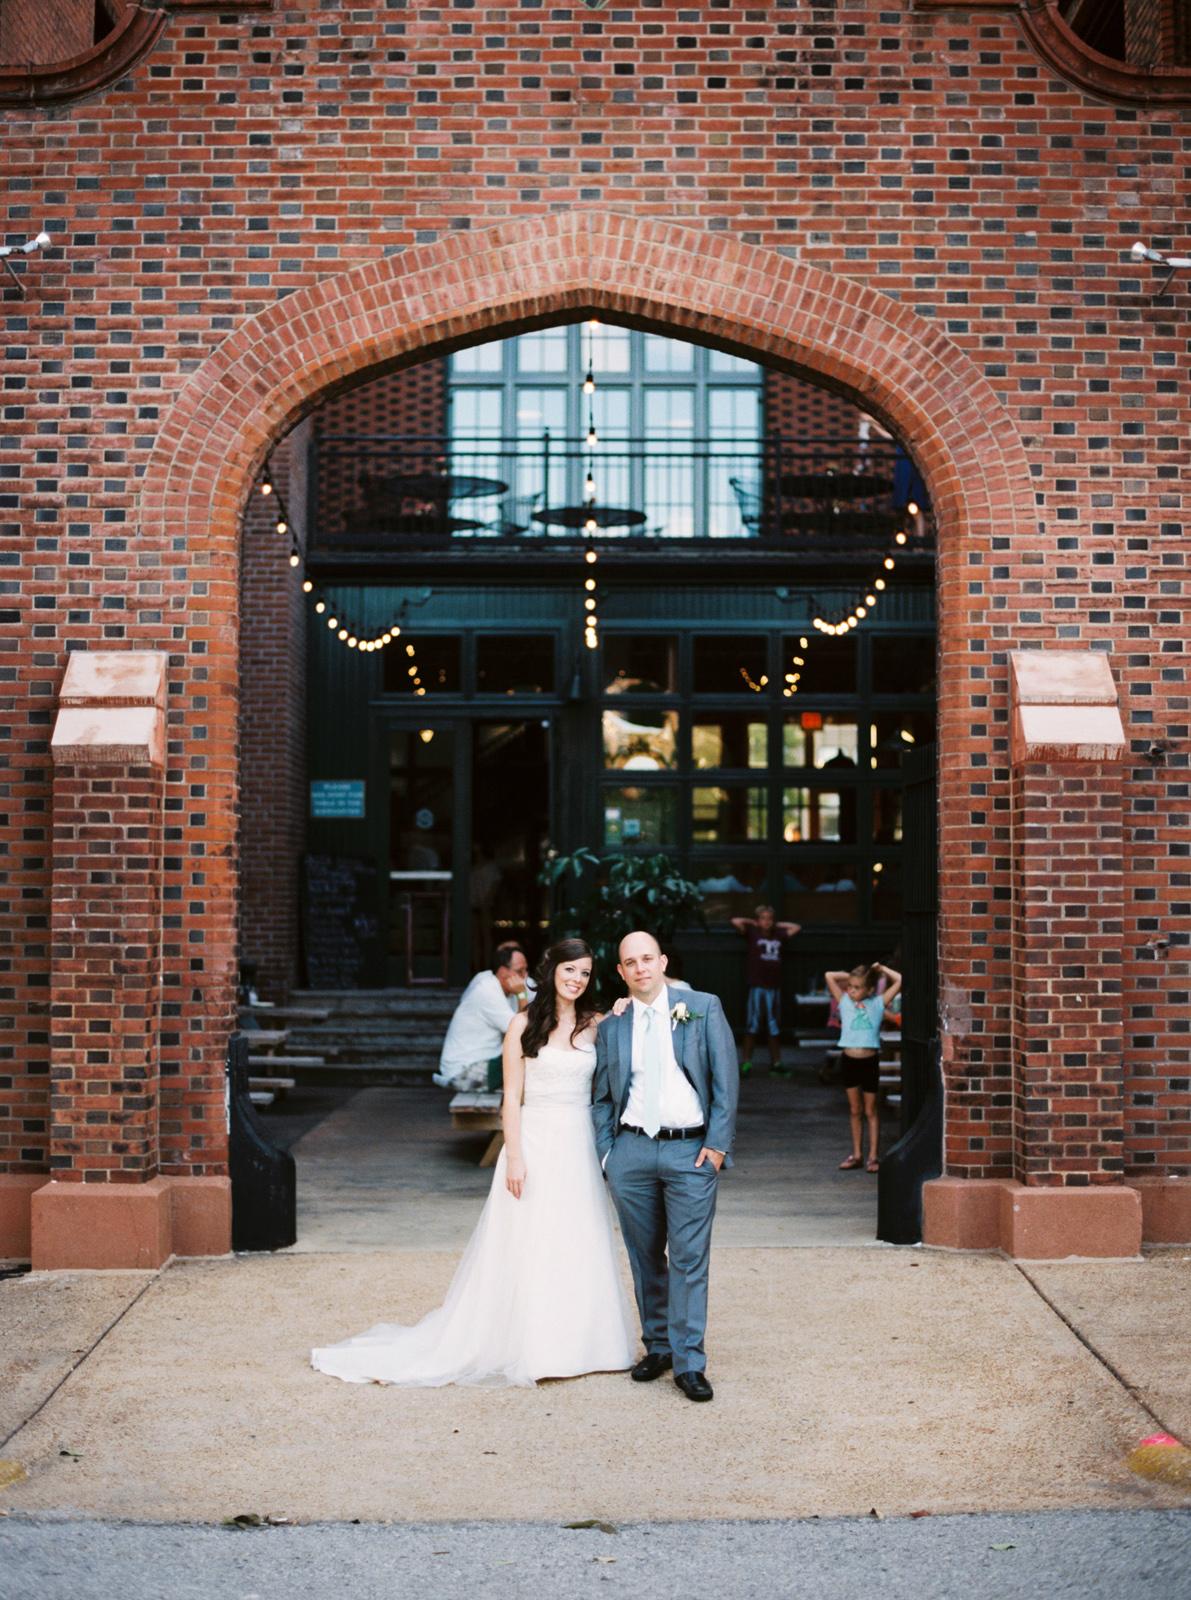 Oldani-Photography-St-Louis-Film-Photographer-Schlafly-Tap-Room-Wedding-Reception8603_01.jpg